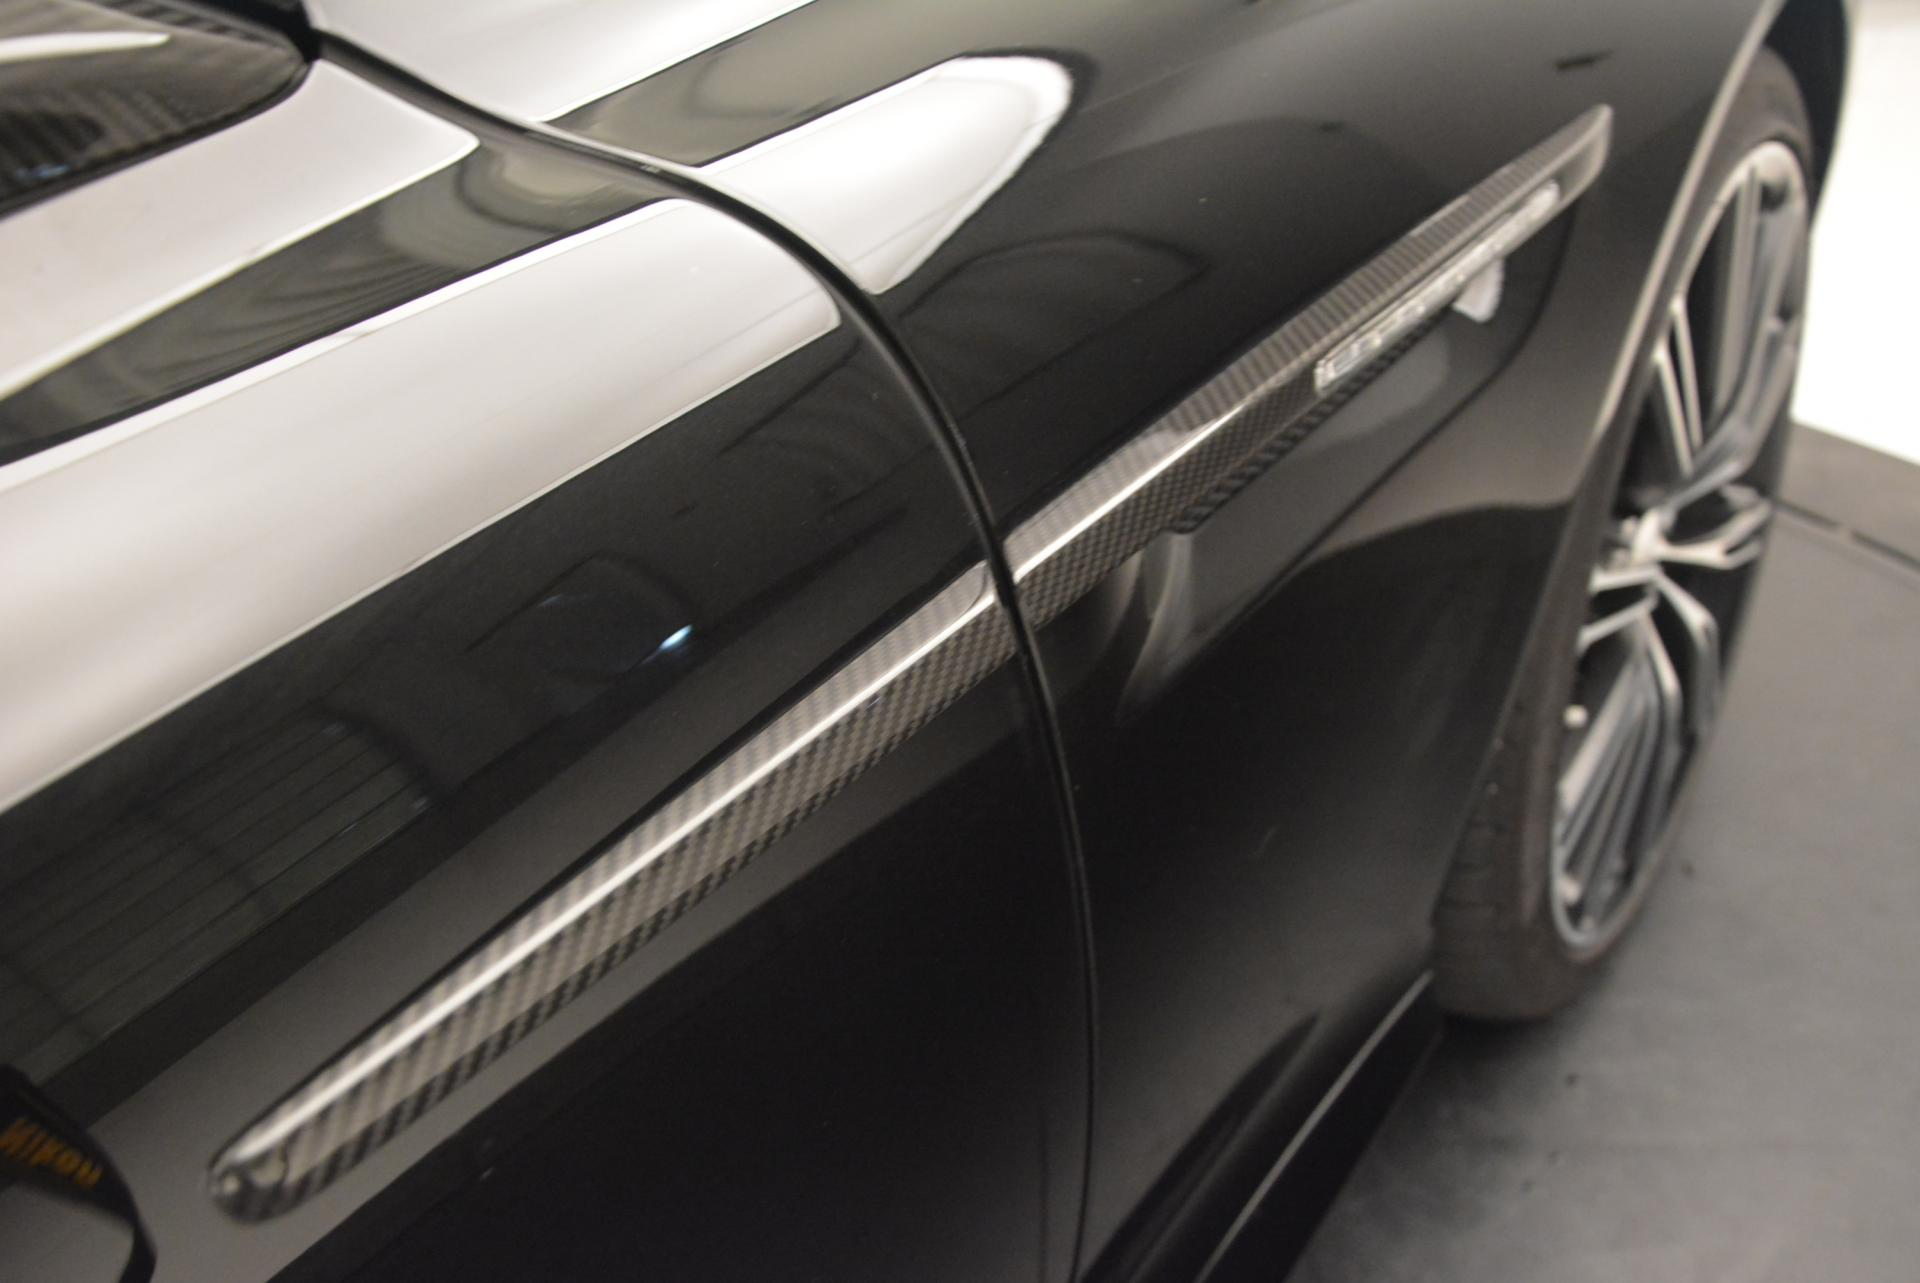 Used 2015 Aston Martin DB9 Carbon Edition For Sale In Greenwich, CT. Alfa Romeo of Greenwich, 7349 528_p23